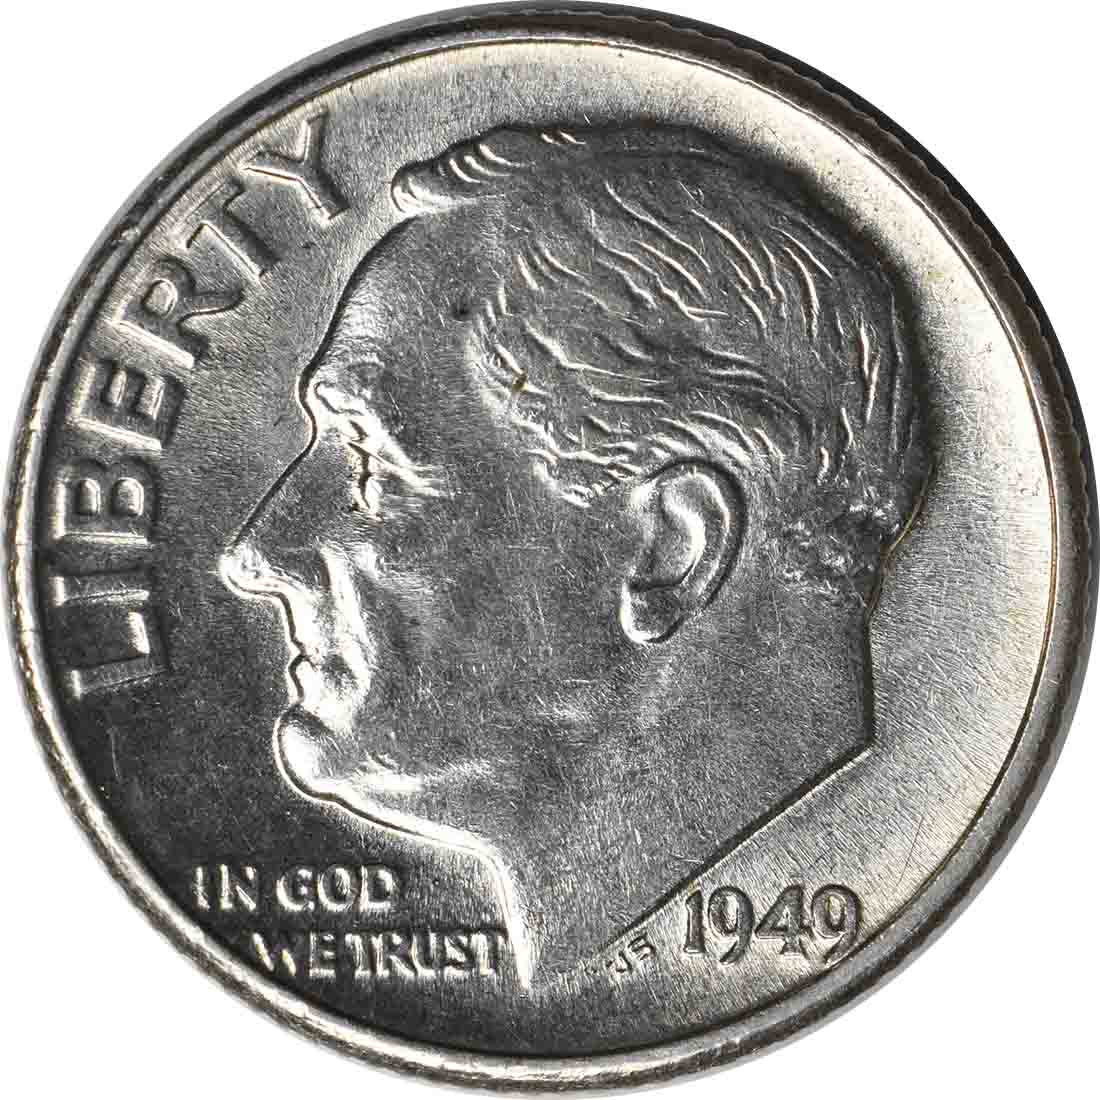 1949 Roosevelt Silver Dime AU58 Uncertified